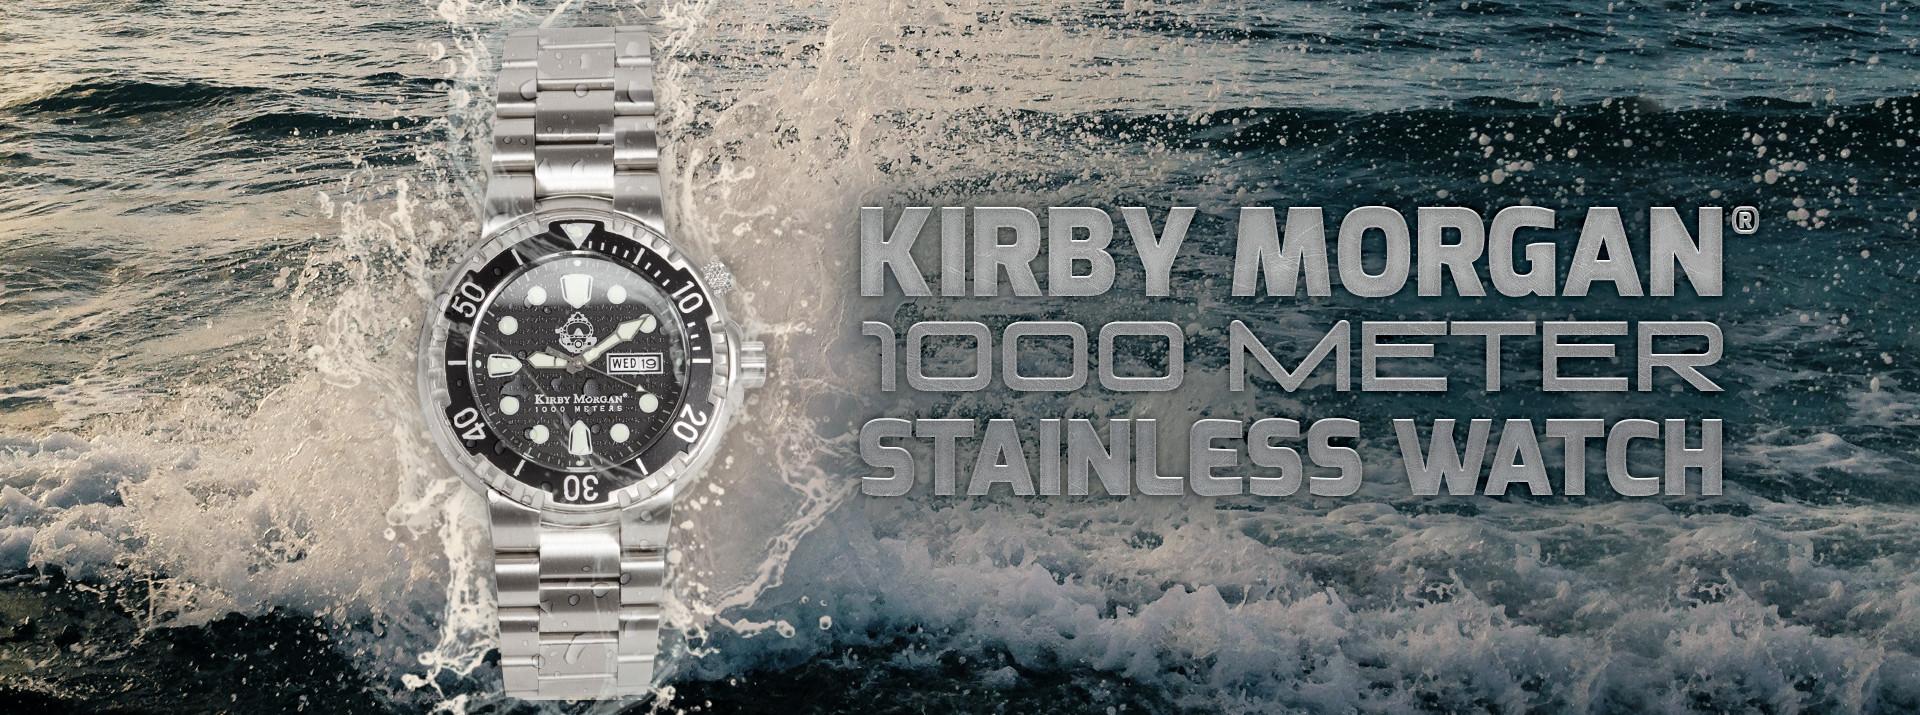 1000 Meter Stainless Steel Watch